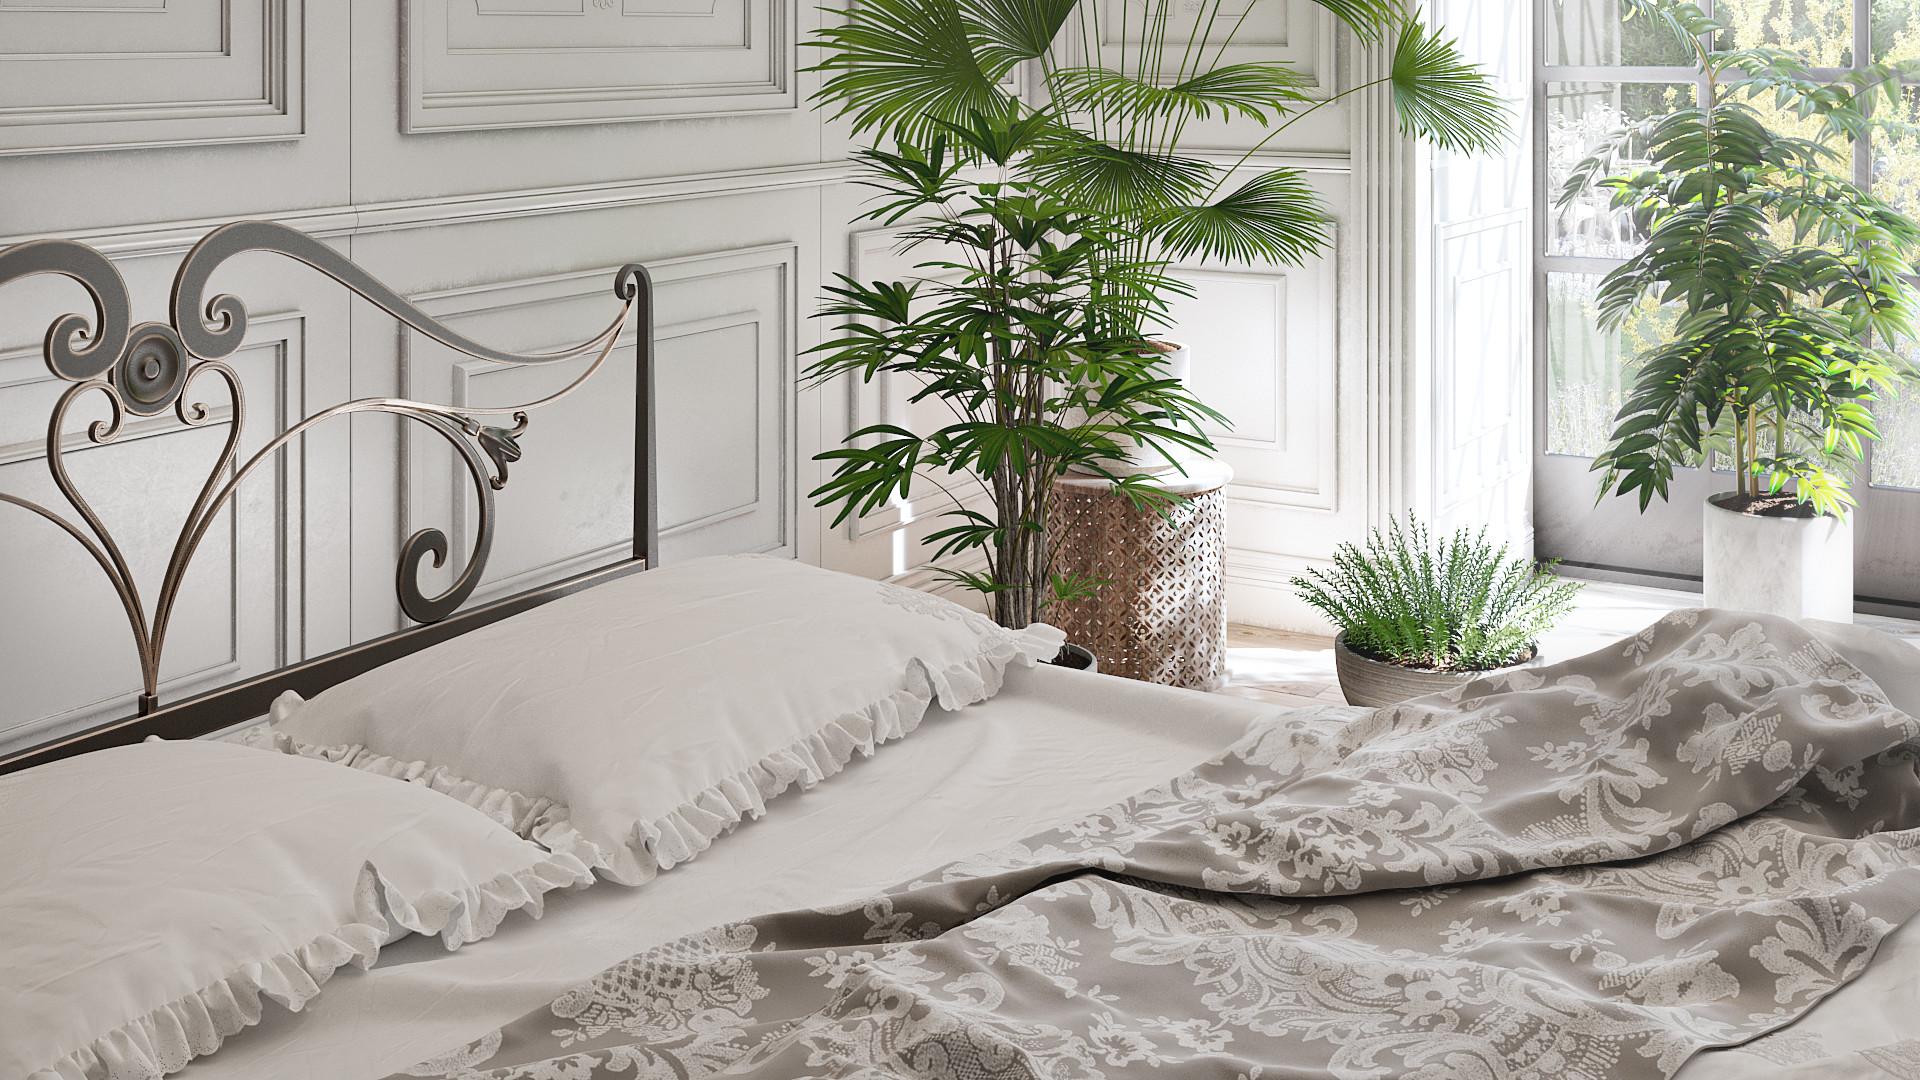 ArtStation - Bedroom with a View, Stefanie Chapman